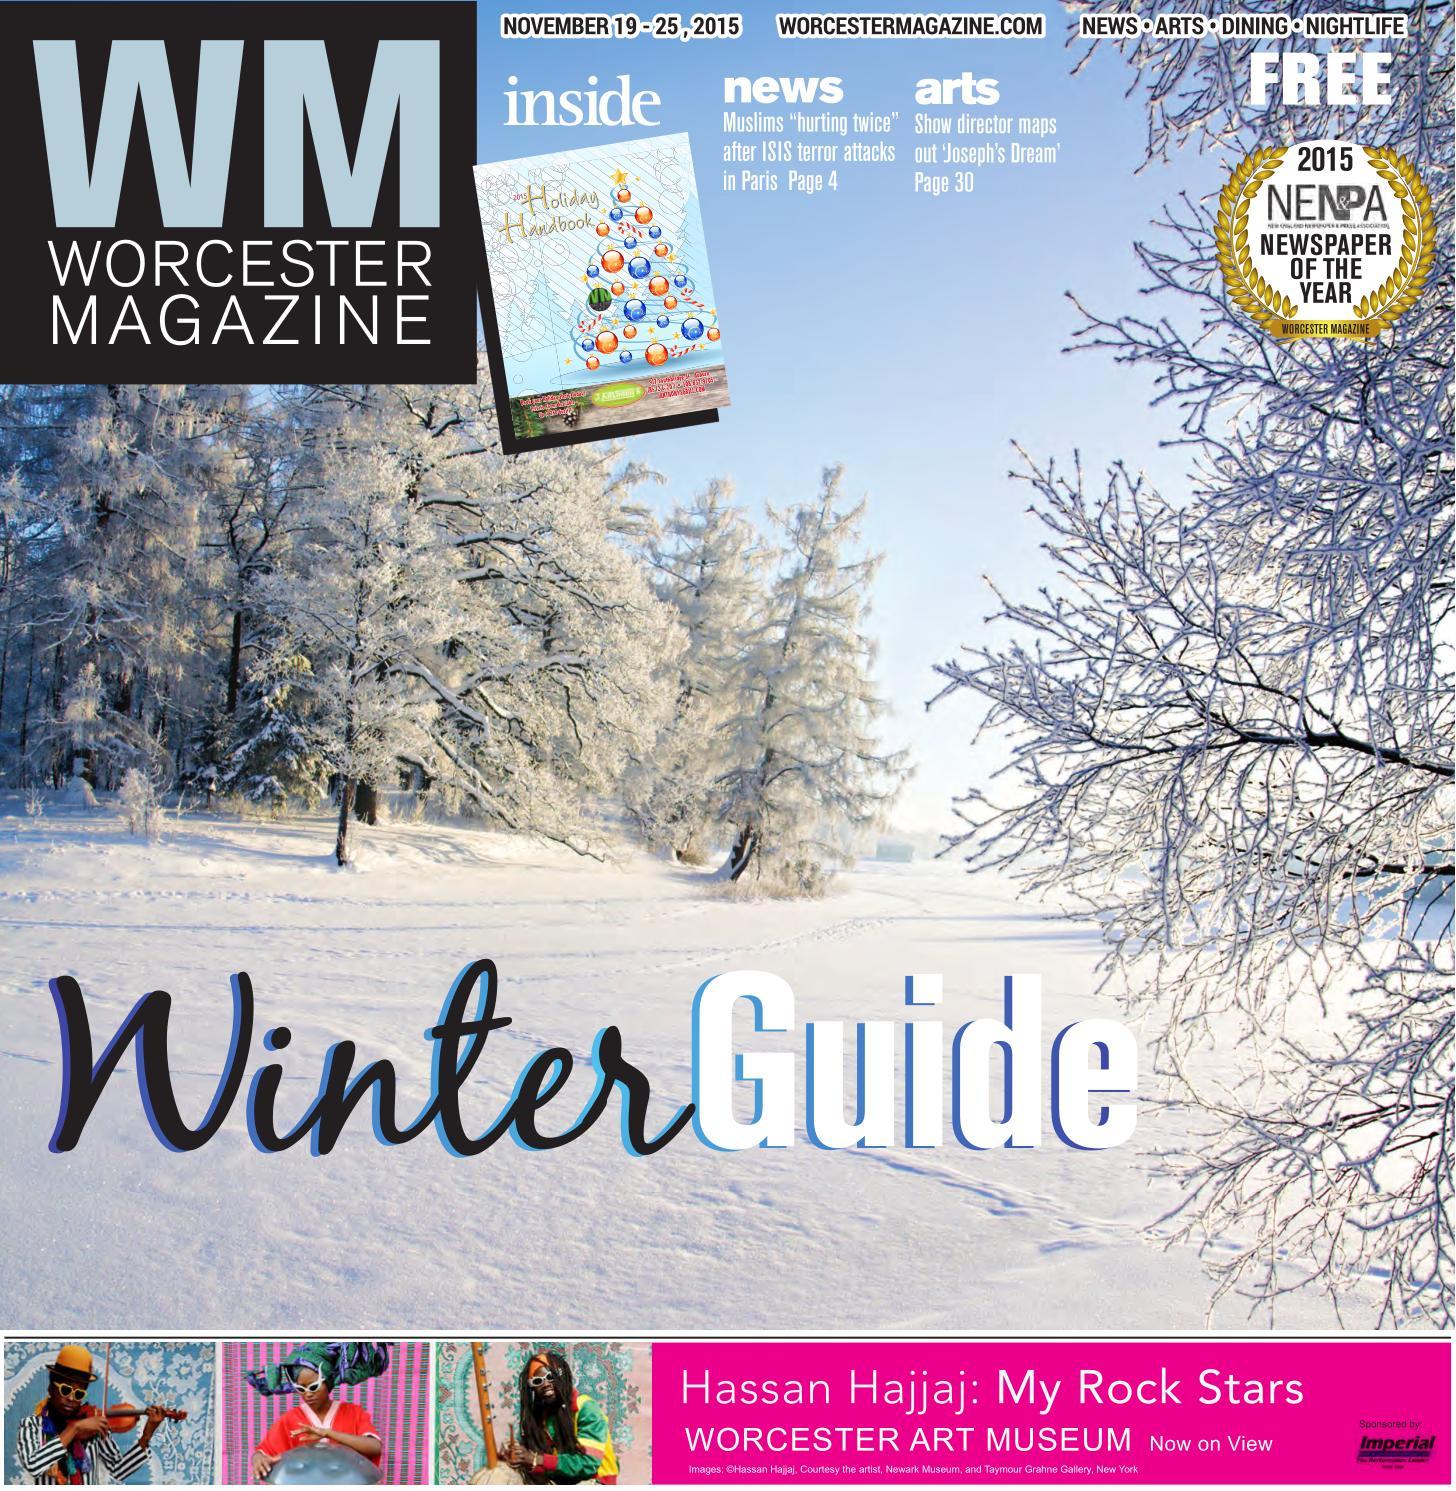 Worcester Magazine November 19  25, 2015 By Worcester Magazine  Issuu